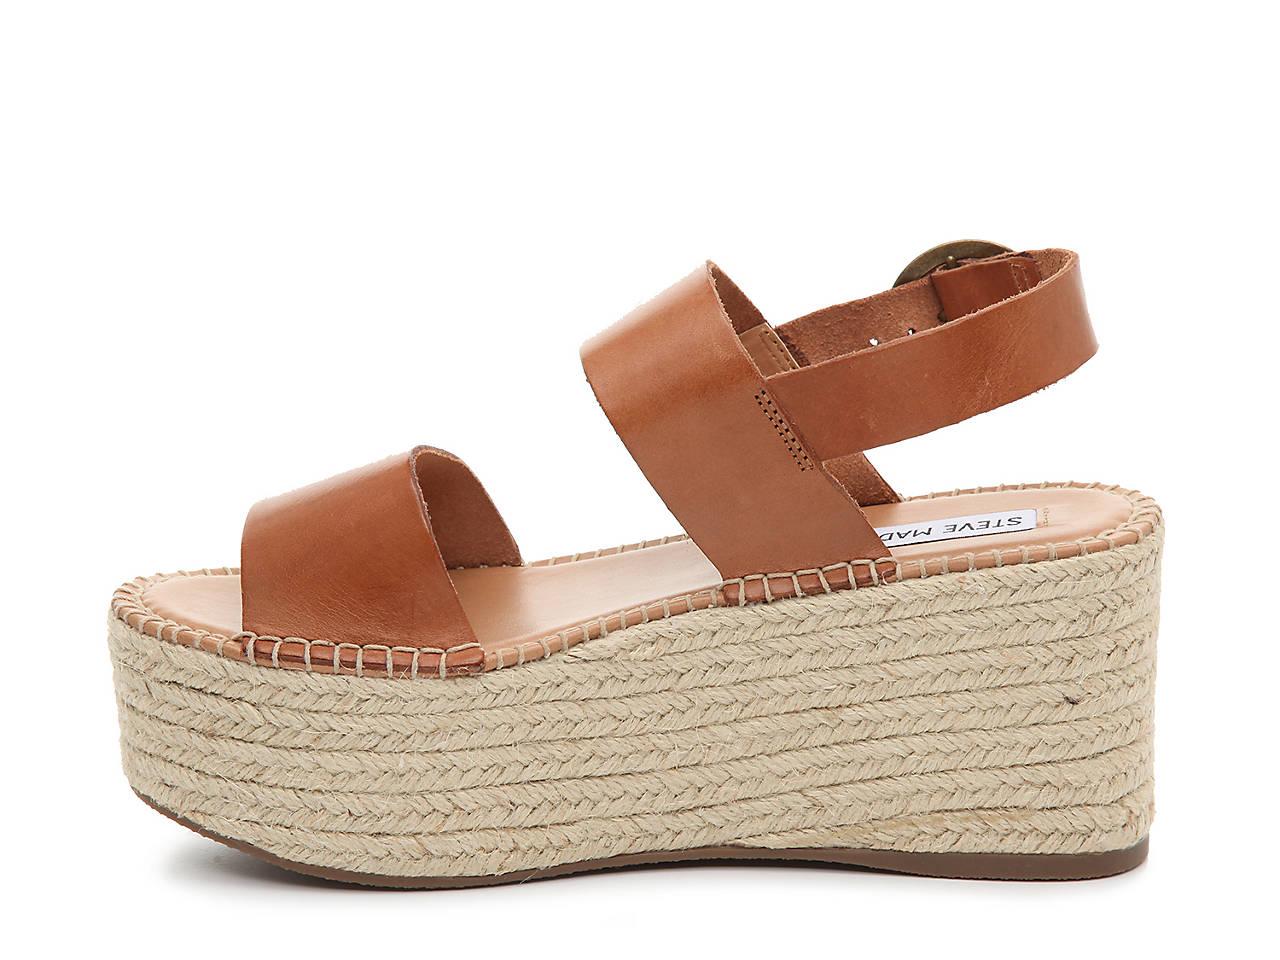 ab8acdea912 Steve Madden Cali Espadrille Wedge Sandal Men s Shoes